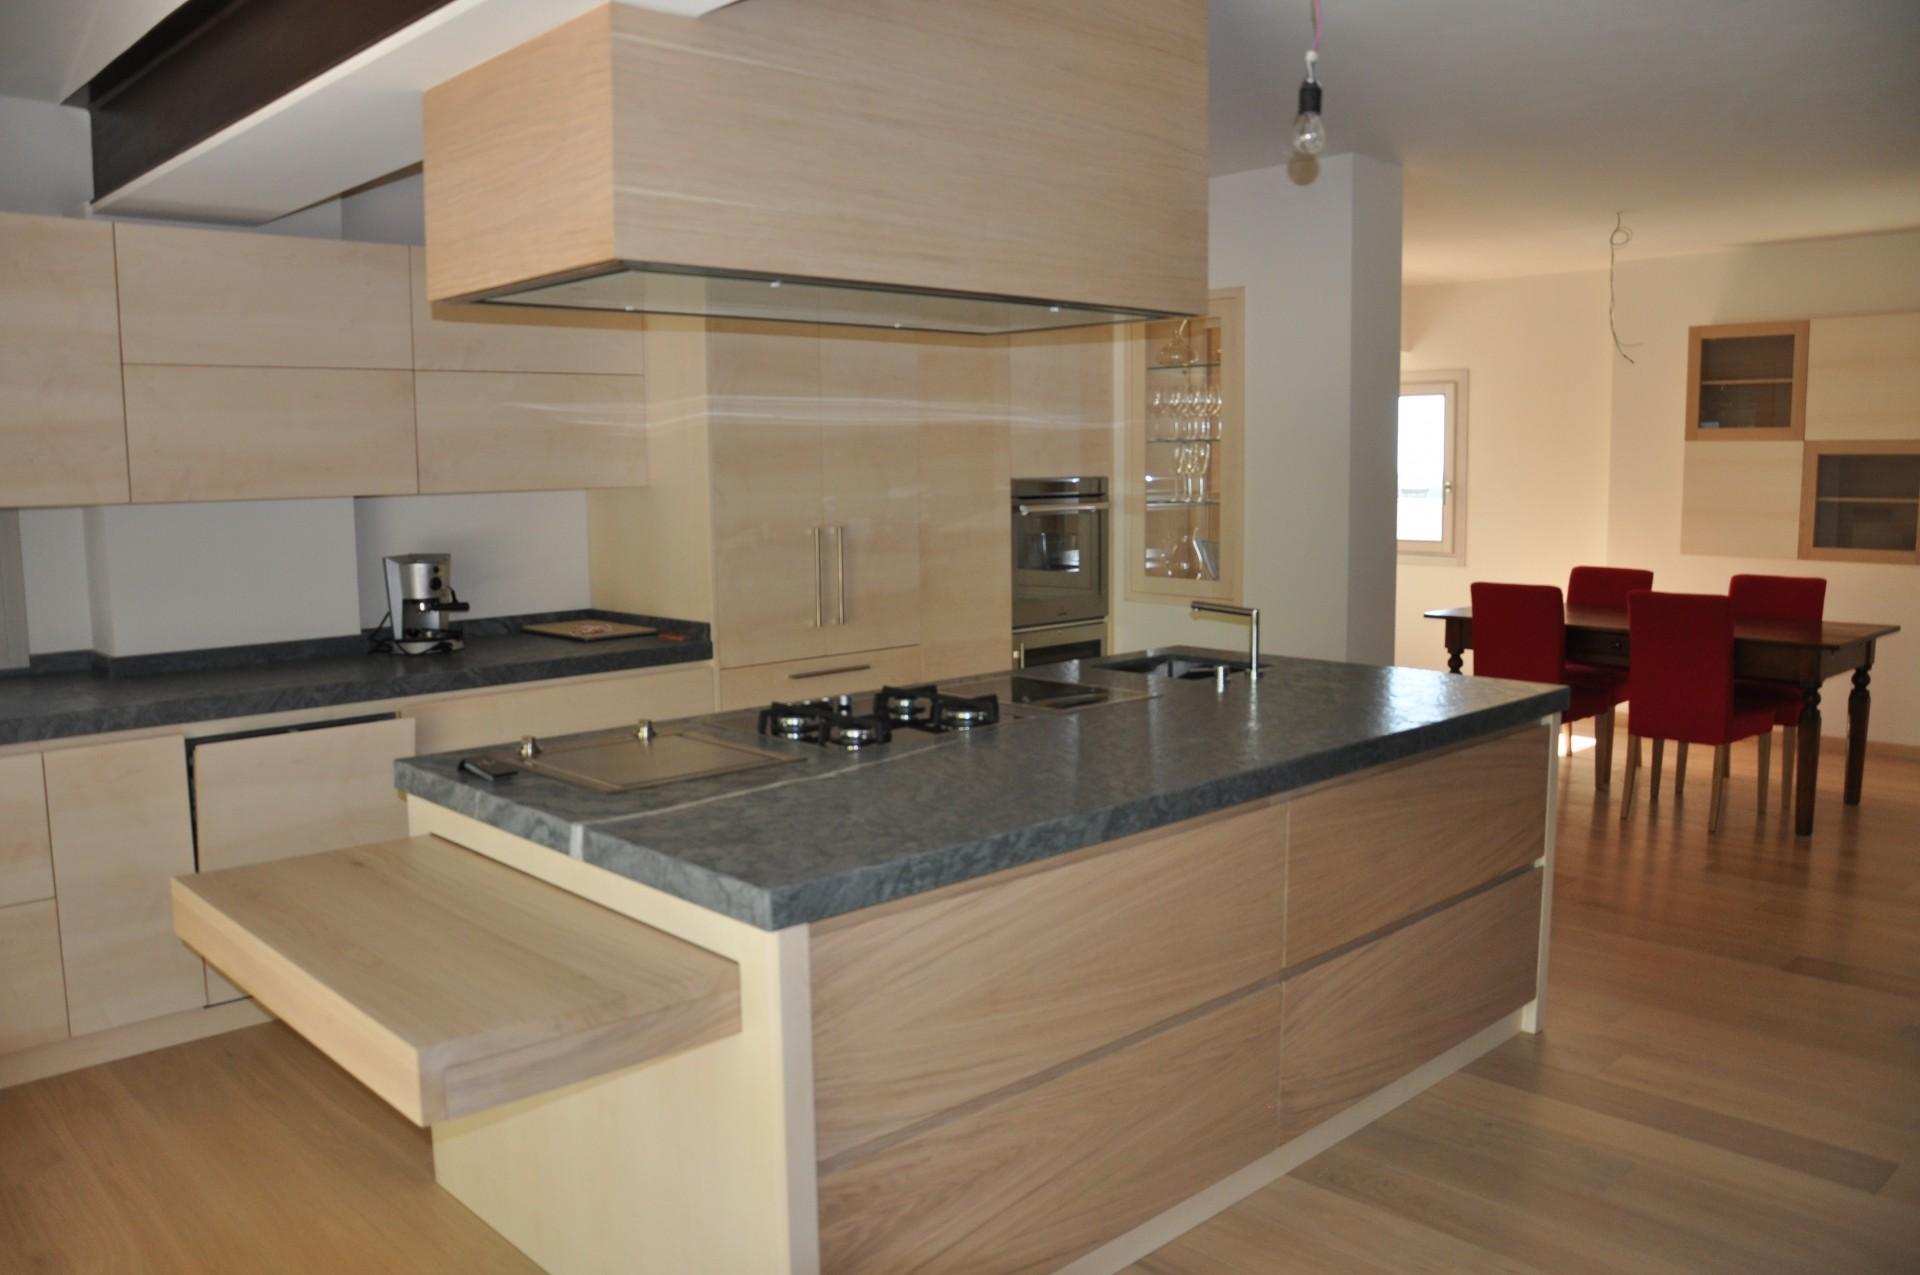 Preferenza cucine moderne | Fadini Mobili Cerea Verona JA69